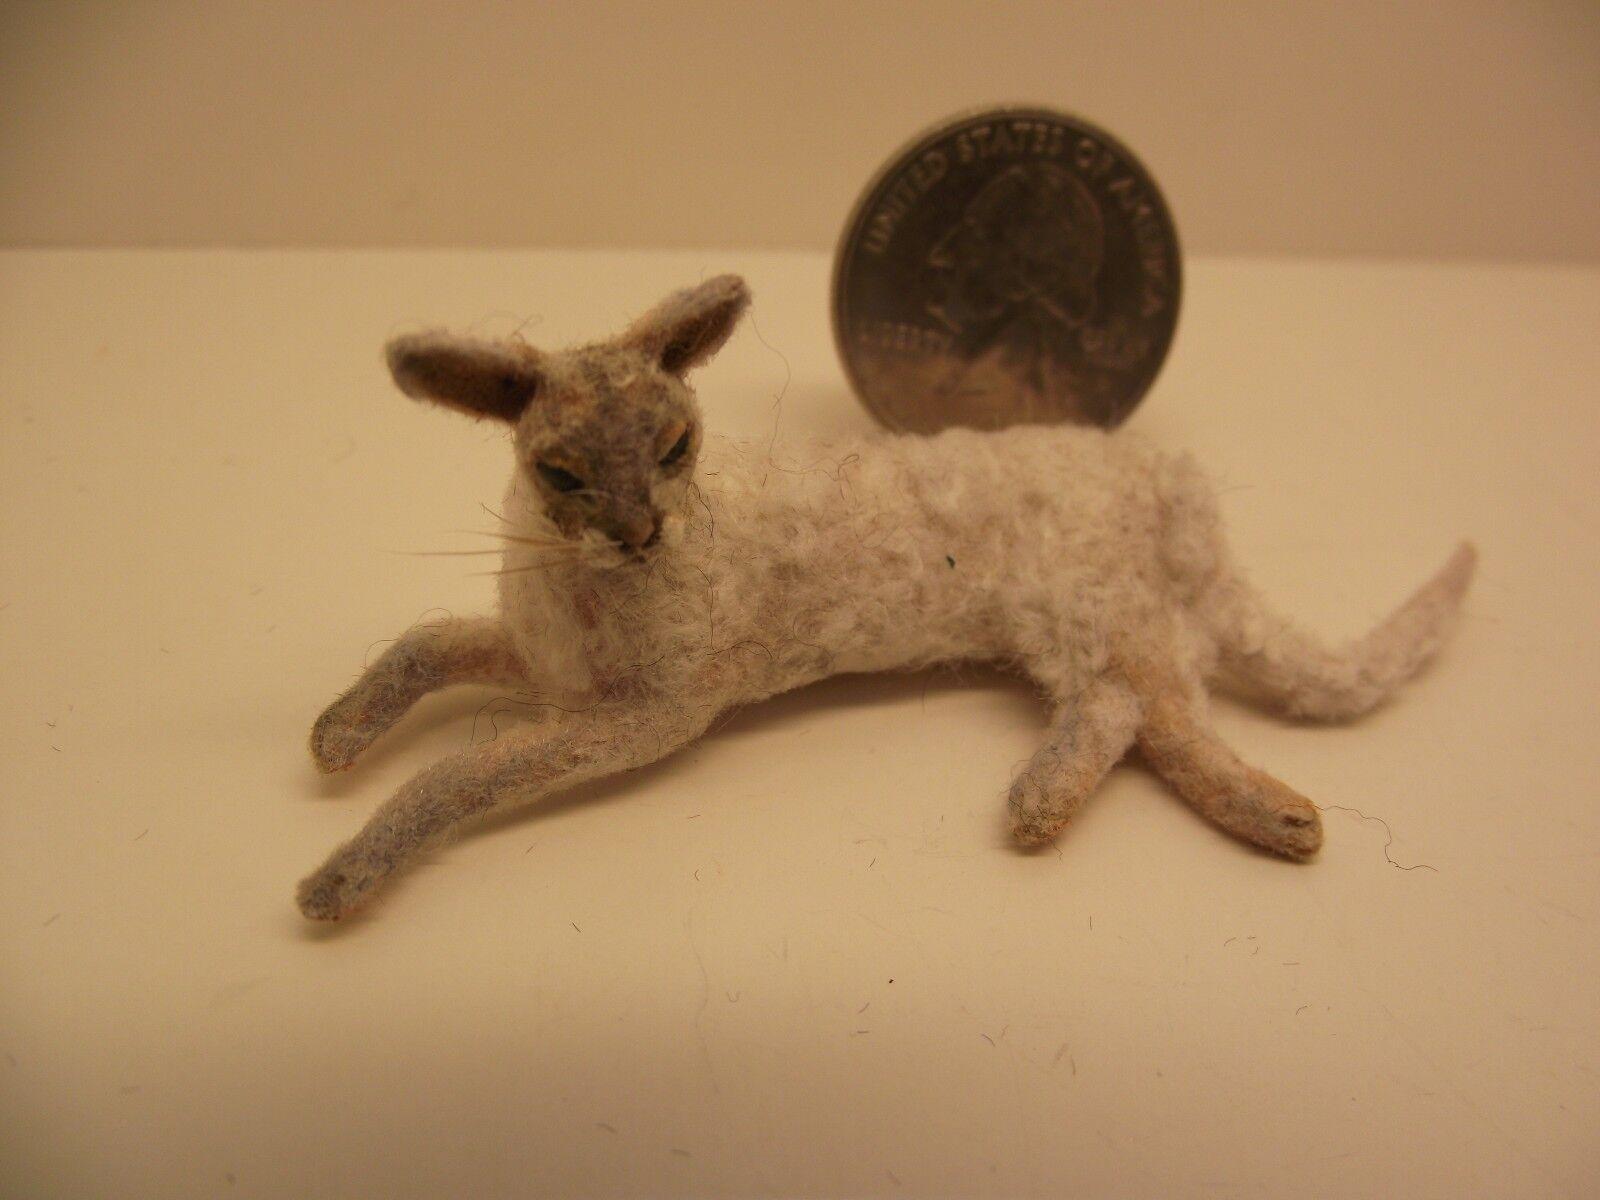 1 12 Scale Miniature Dollhouse Weiß Cornish Rex Cat by Lucy Maloney